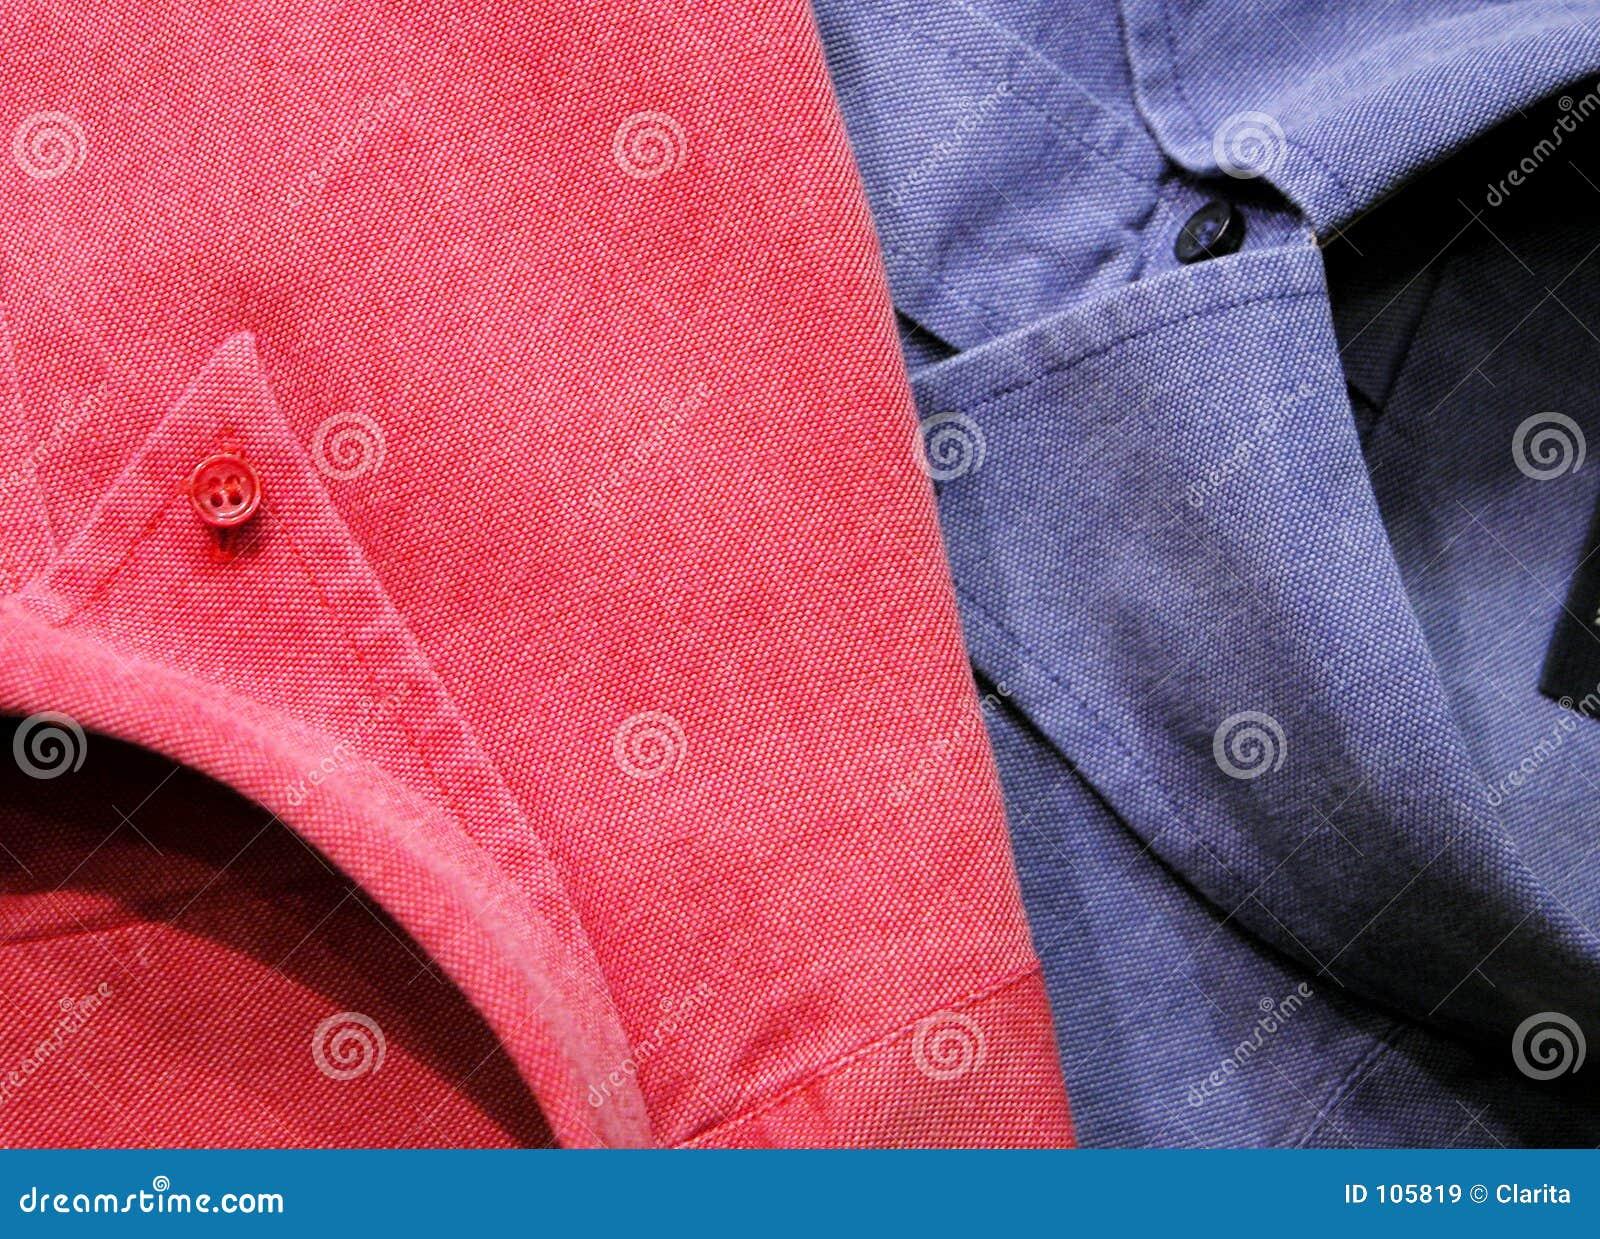 Pink & blue shirts